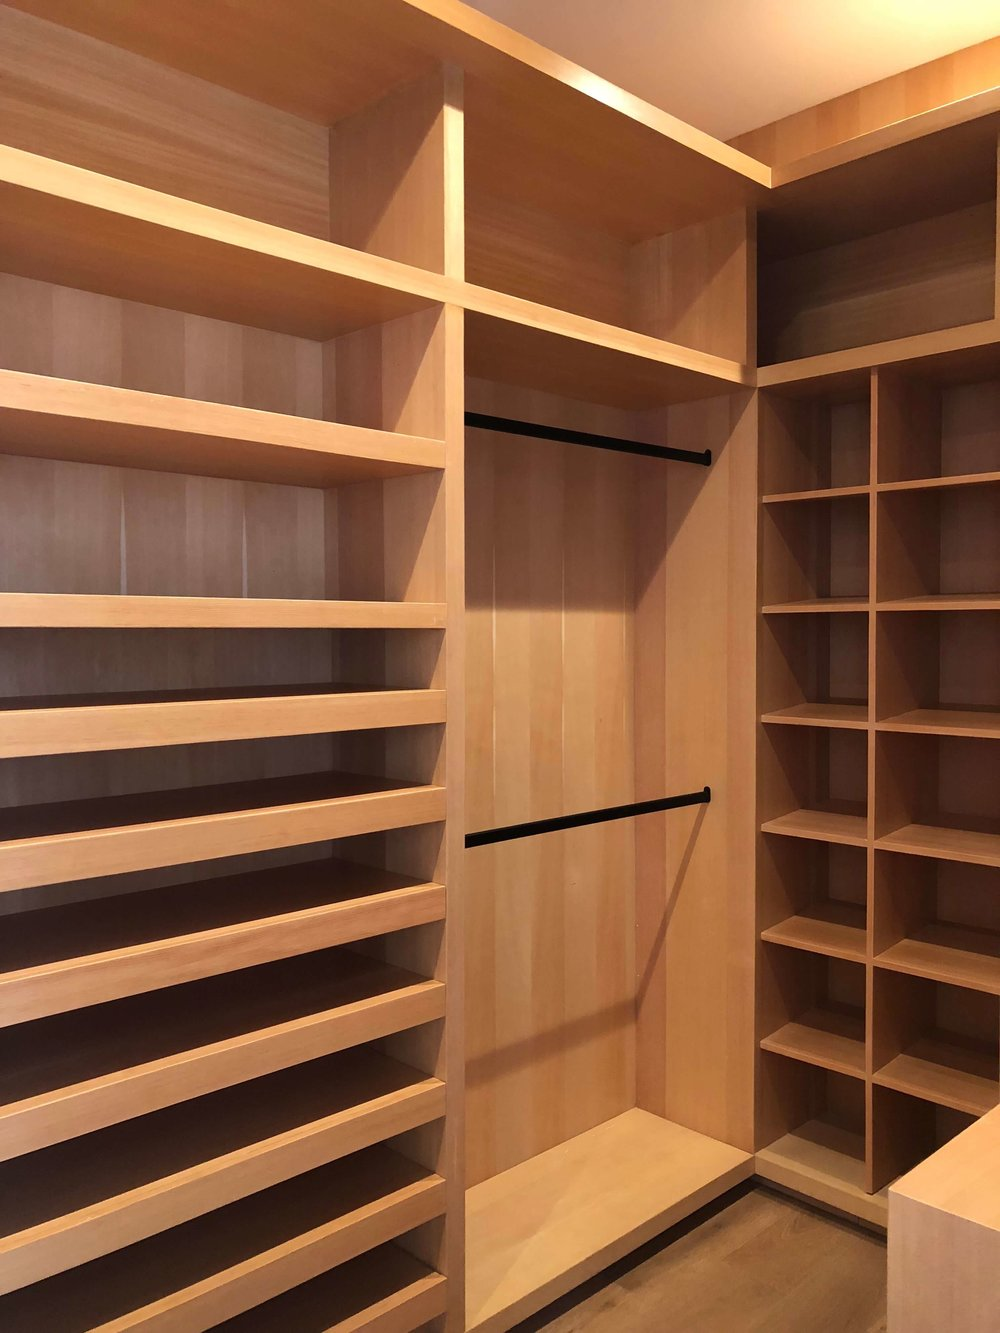 Master closet in natural oak in contemporary home - Dwell on Design's Fall Home Tour, Designer: Vitus Matare #closet #cabinetry #closetdesign